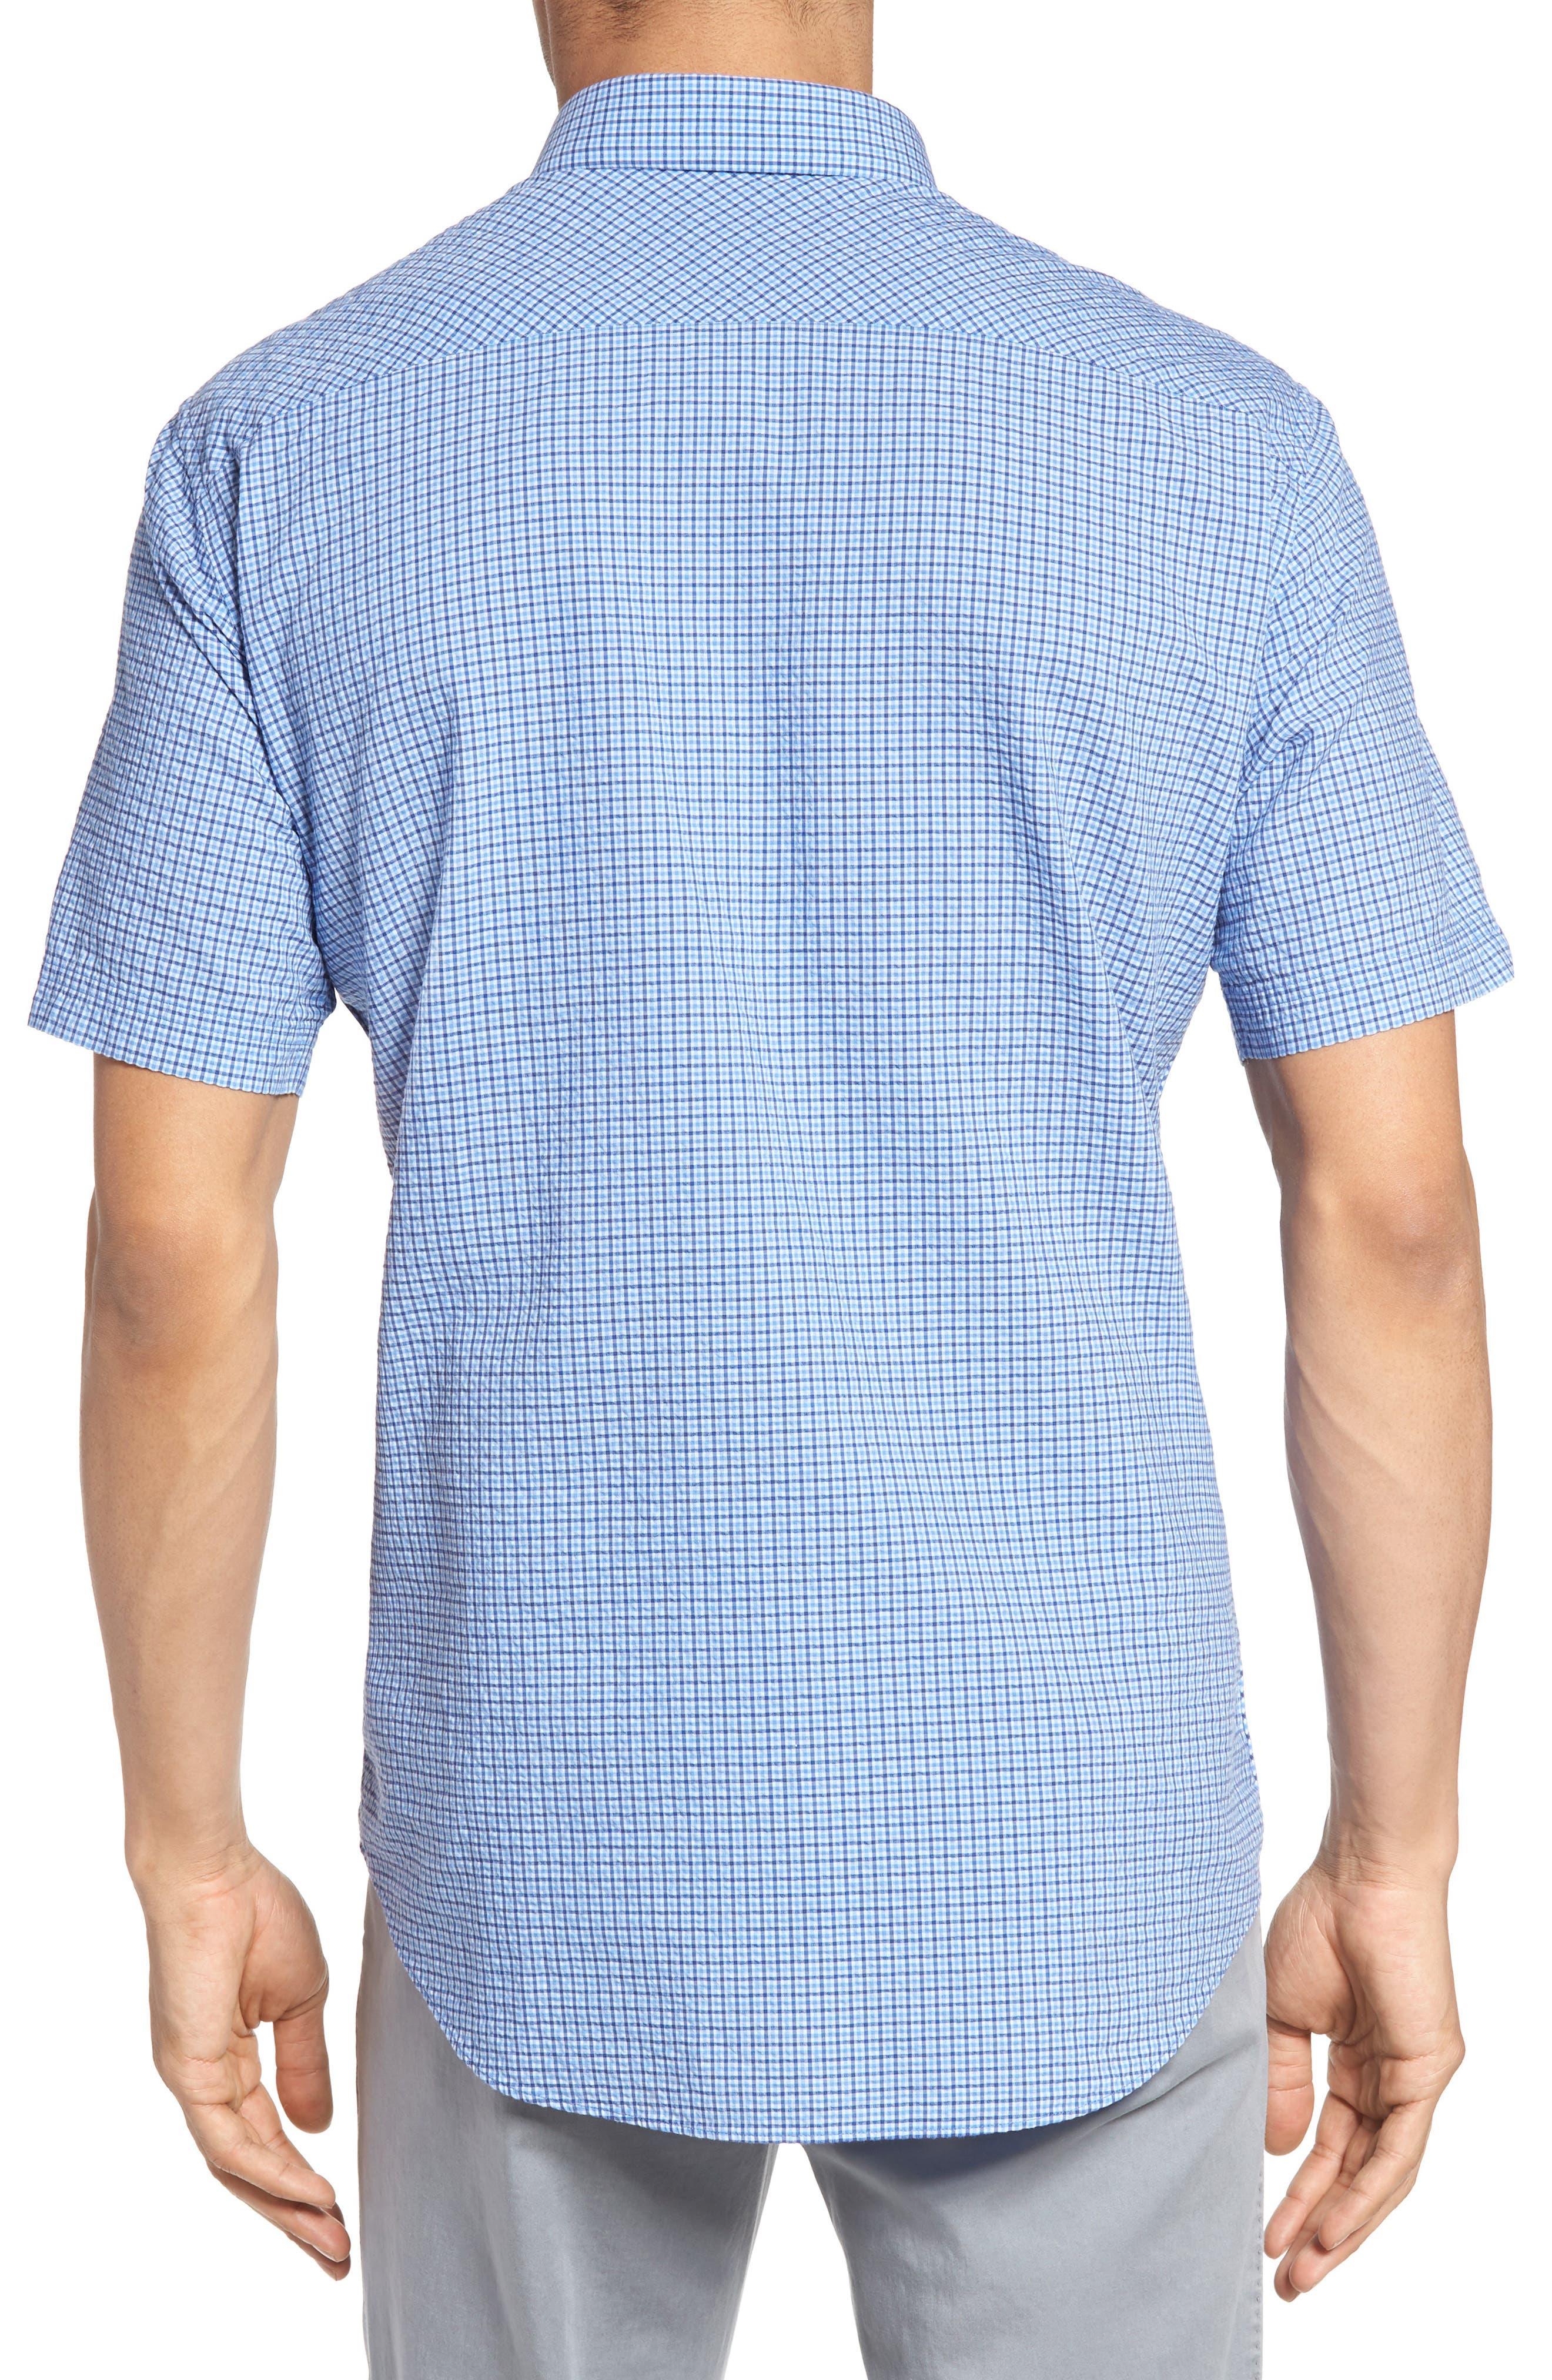 Billy Trim Fit Plaid Sport Shirt,                             Alternate thumbnail 2, color,                             422